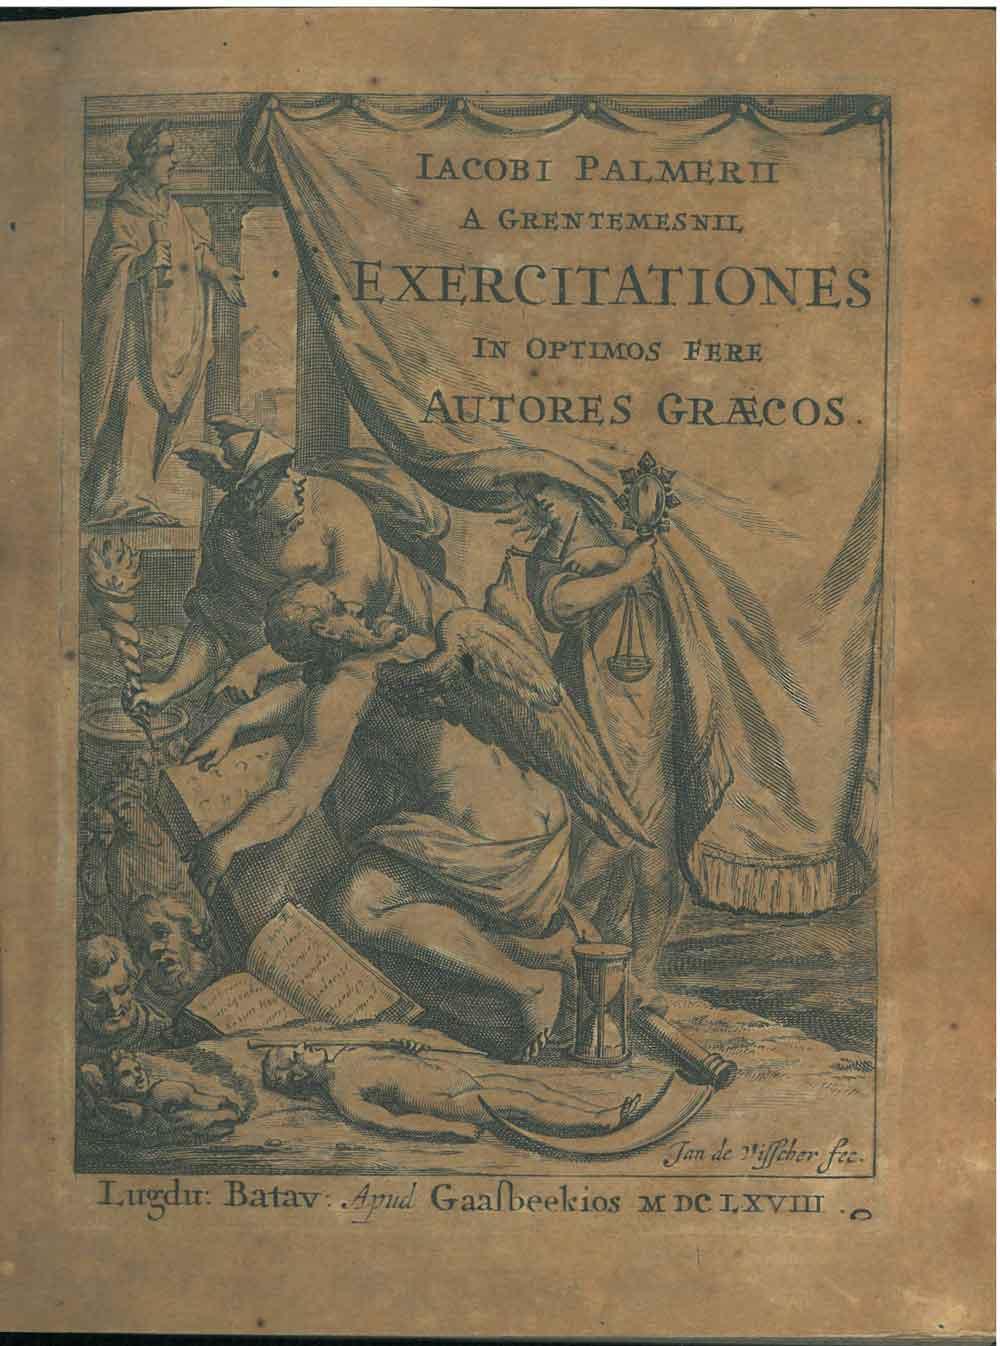 Jacobi Palmerii a Grentemesnii, Exercitationes in optimos: Le Paulmier de